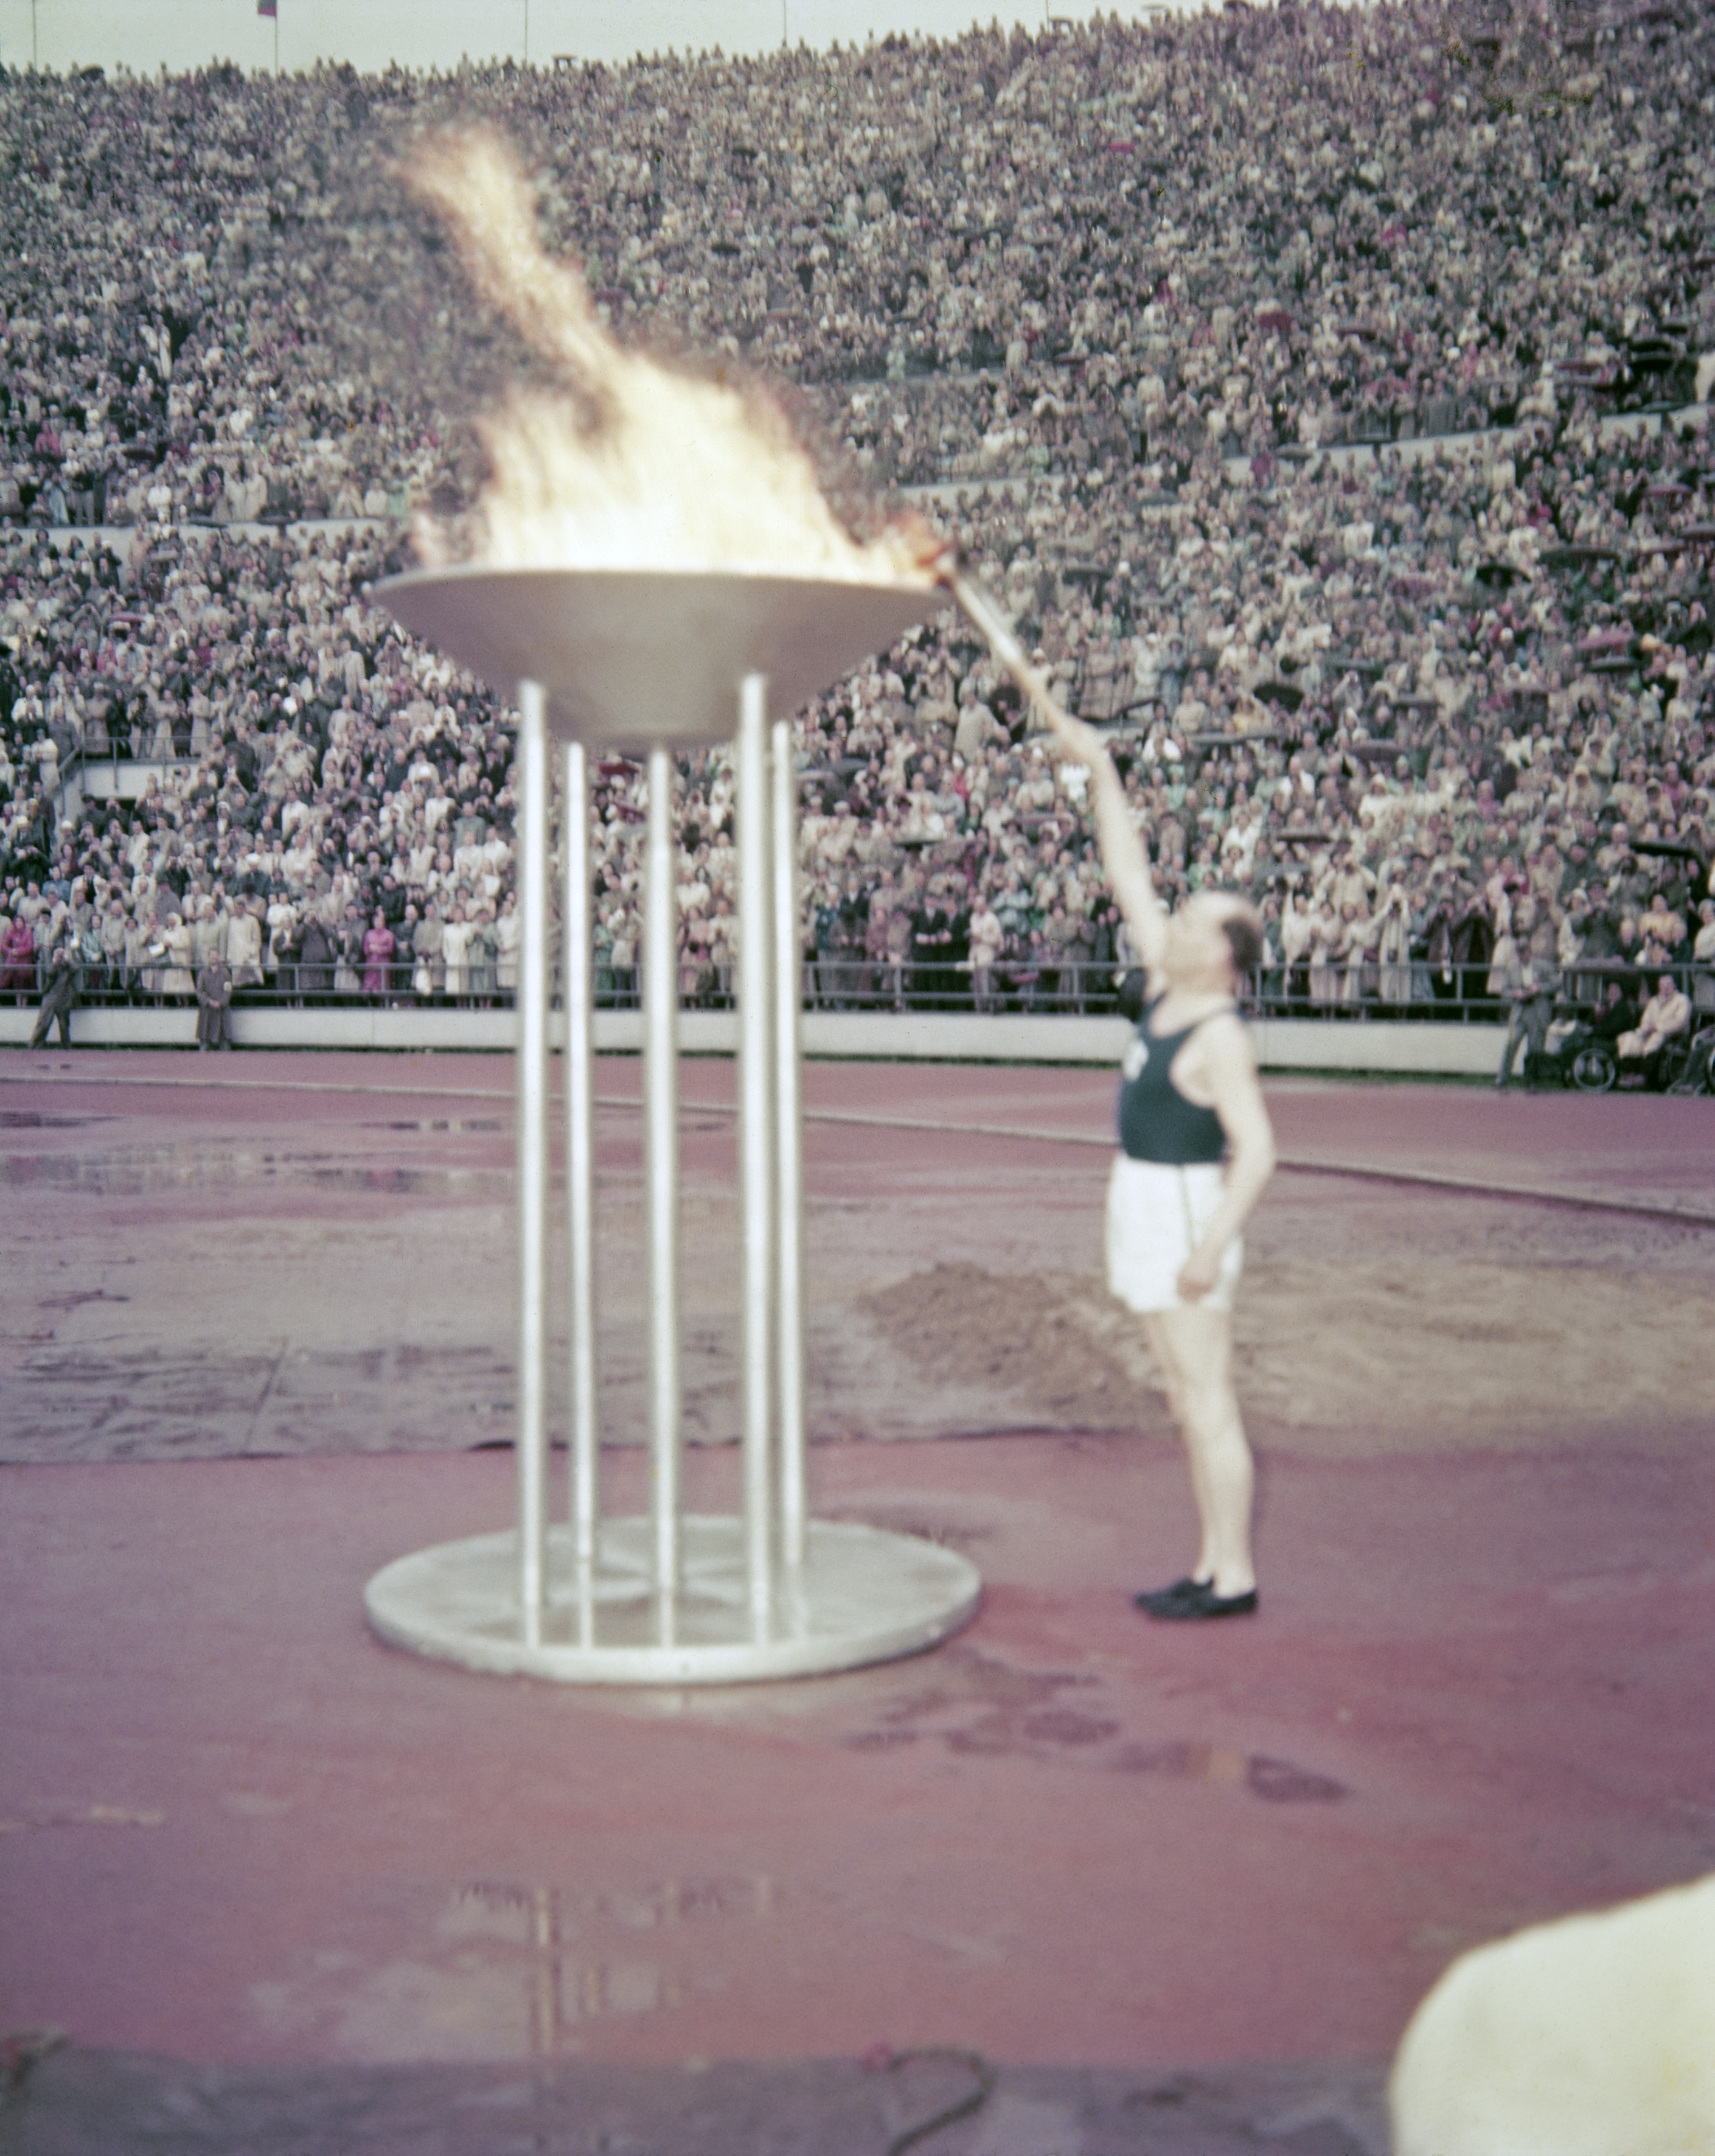 https://upload.wikimedia.org/wikipedia/commons/a/a0/Olympiatuli_1952.jpg